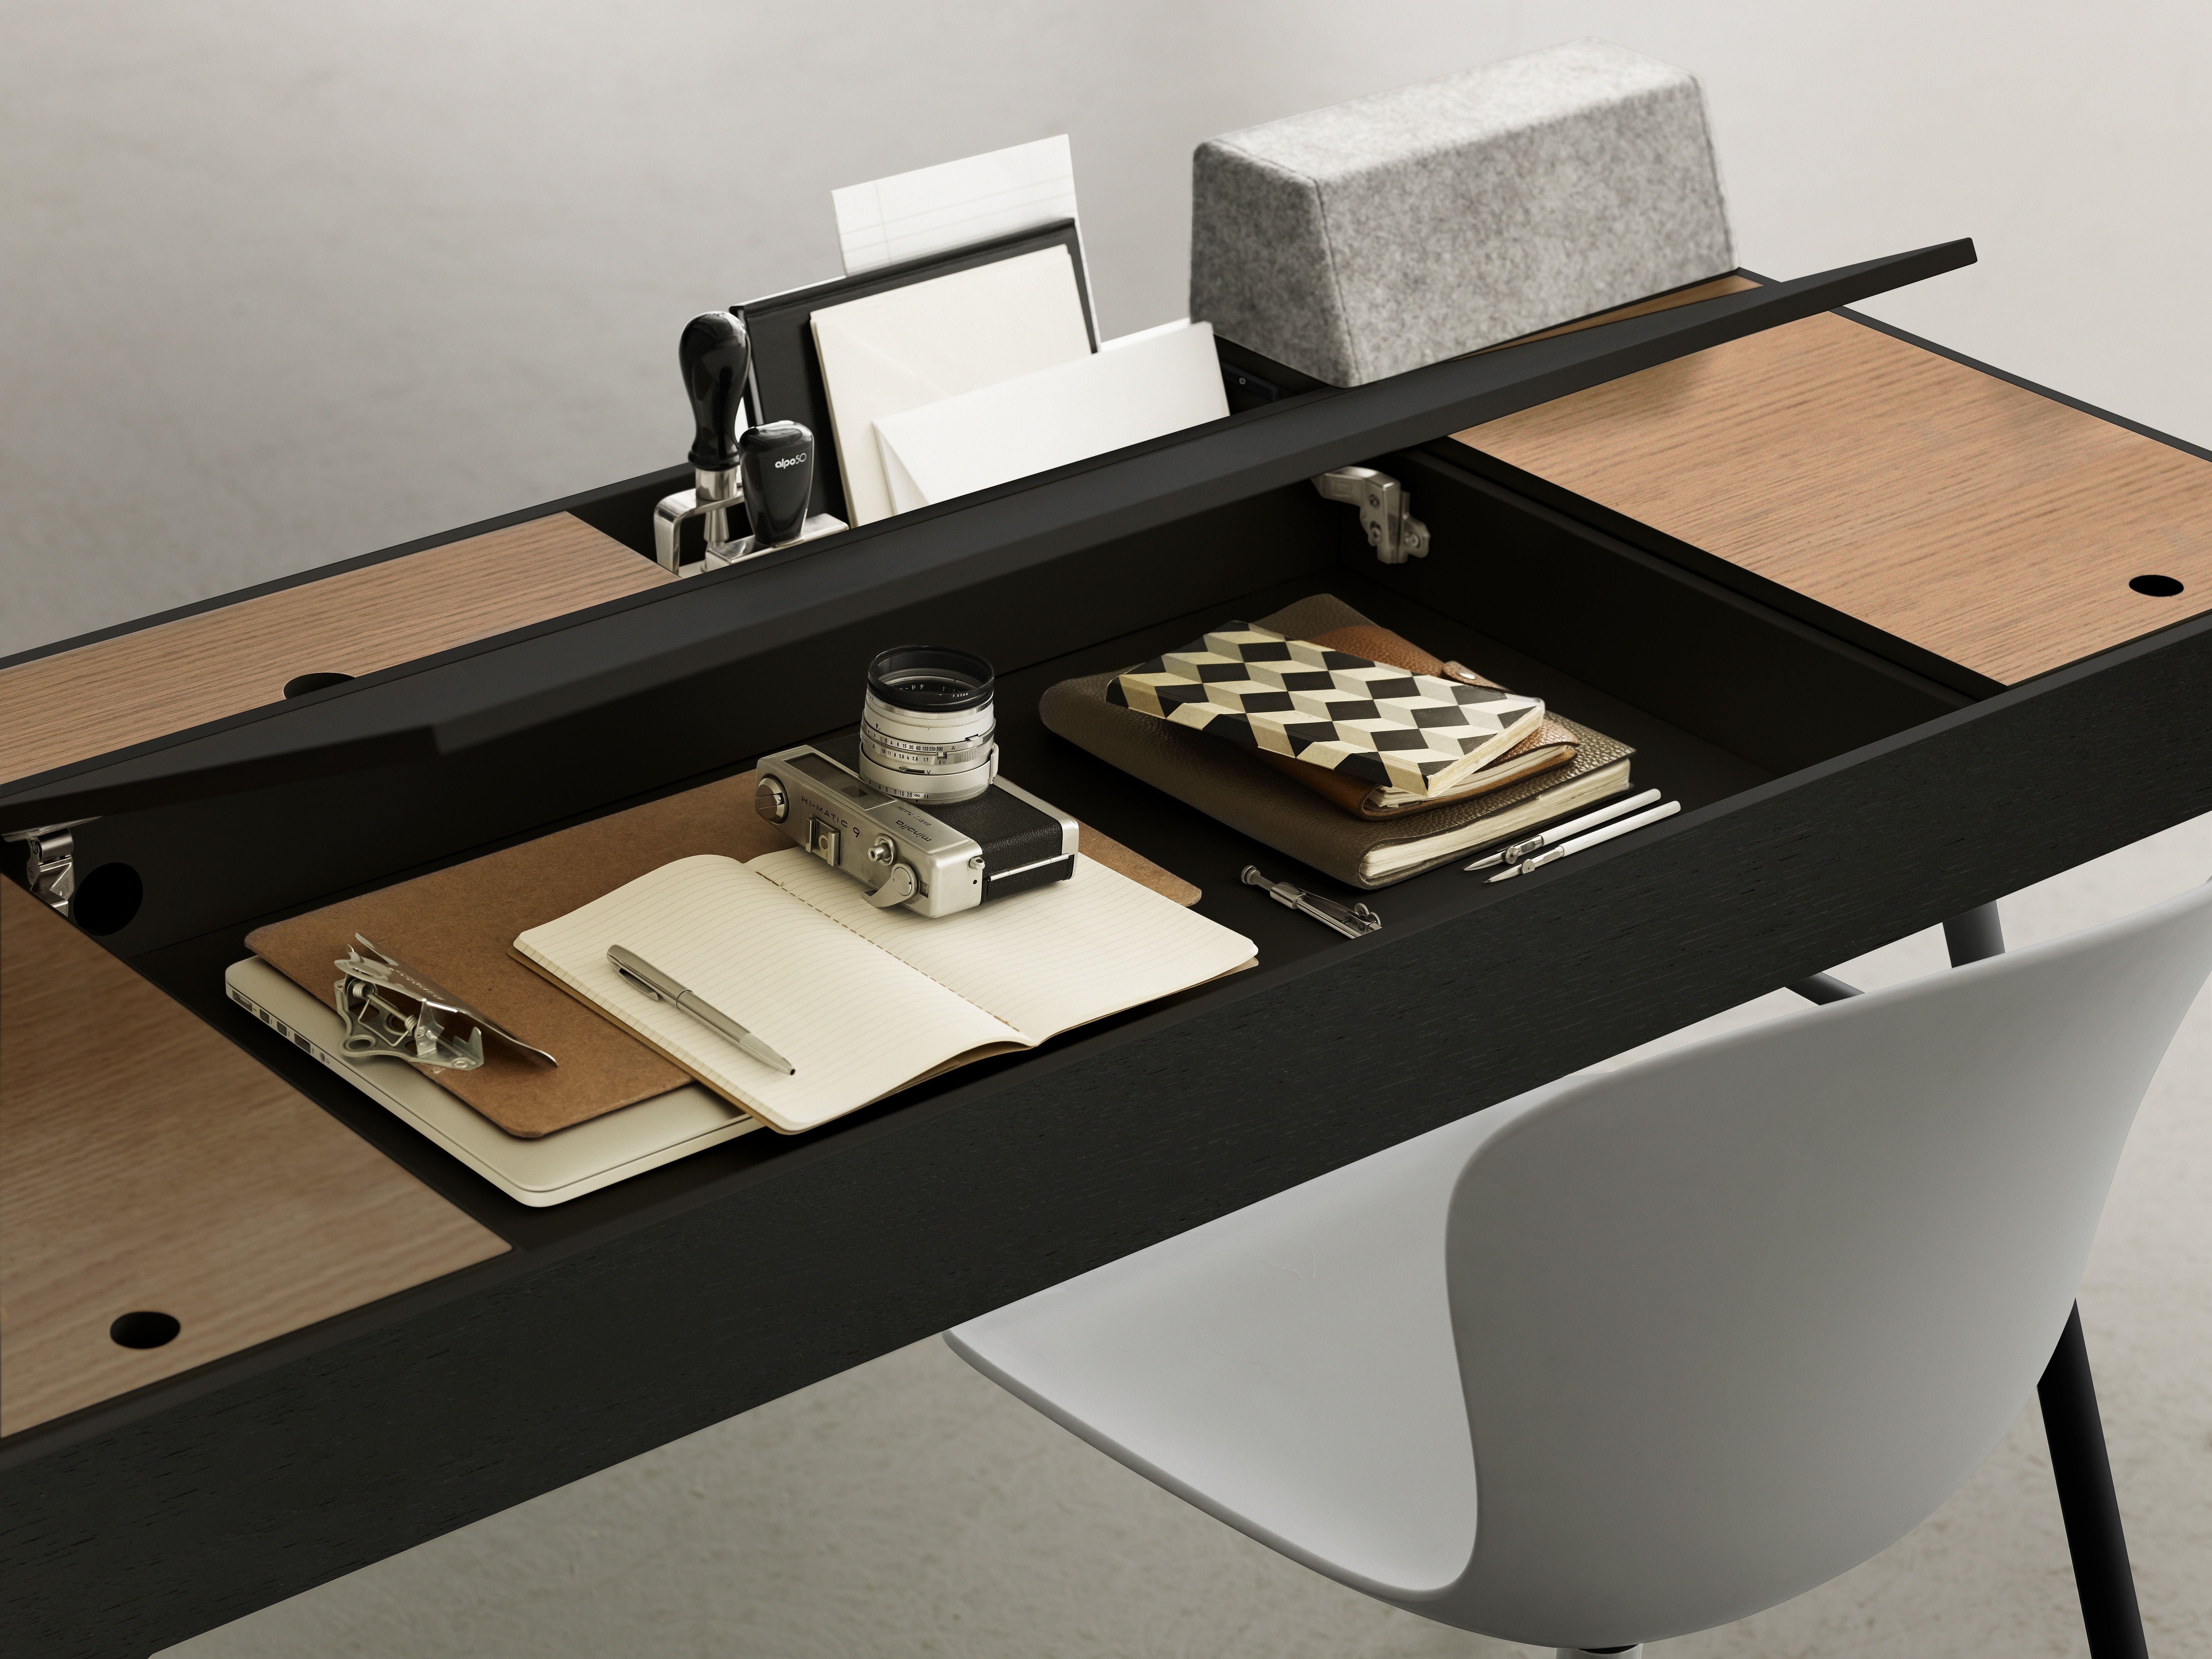 home office modern table. Home Office: Cupertino Schreibtisch #boconcept #scandinaviandesign #interiordesign #homedecor · Contemporary DeskModern Office Modern Table